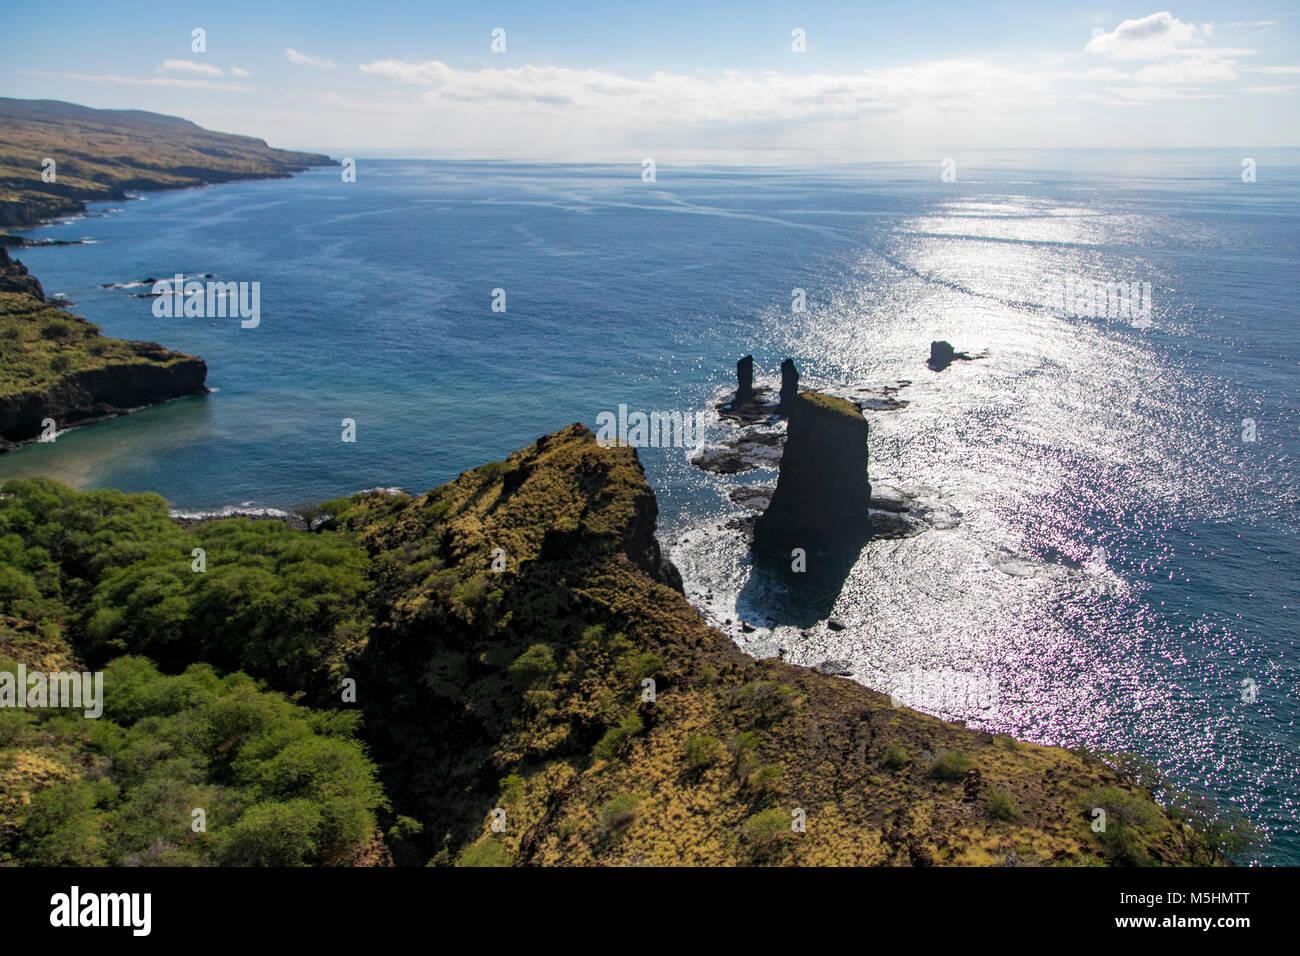 Honopu Bay, AKA, Three Sisters, Island of Lanai, Hawaii Stock Photo